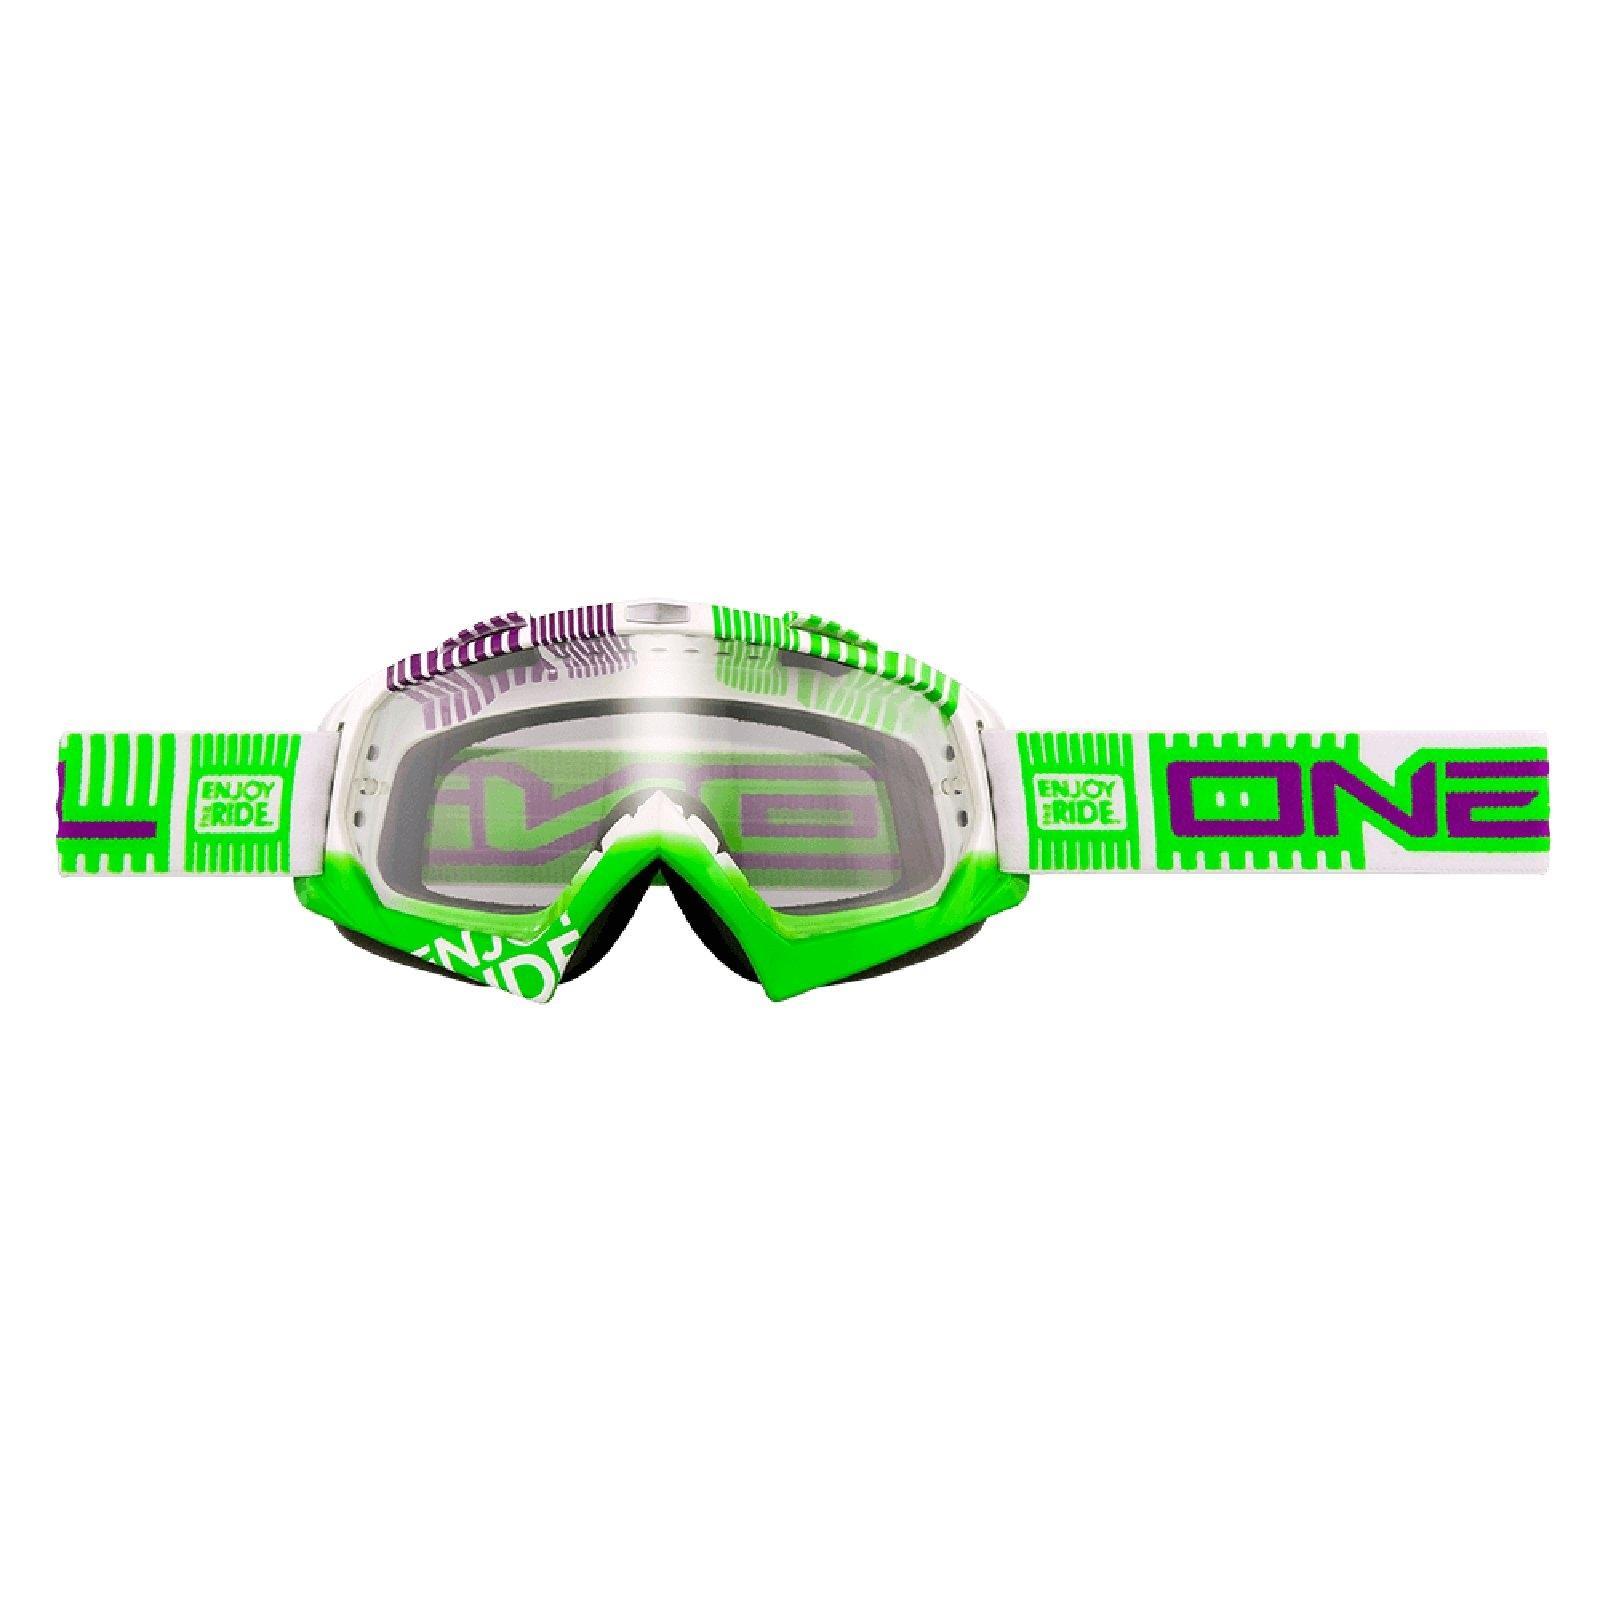 O-039-Neal-B-FLEX-chiaramente-MX-Goggle-Motocross-Occhiali-moto-Downhill-Mountain-Bike-DH miniatura 14